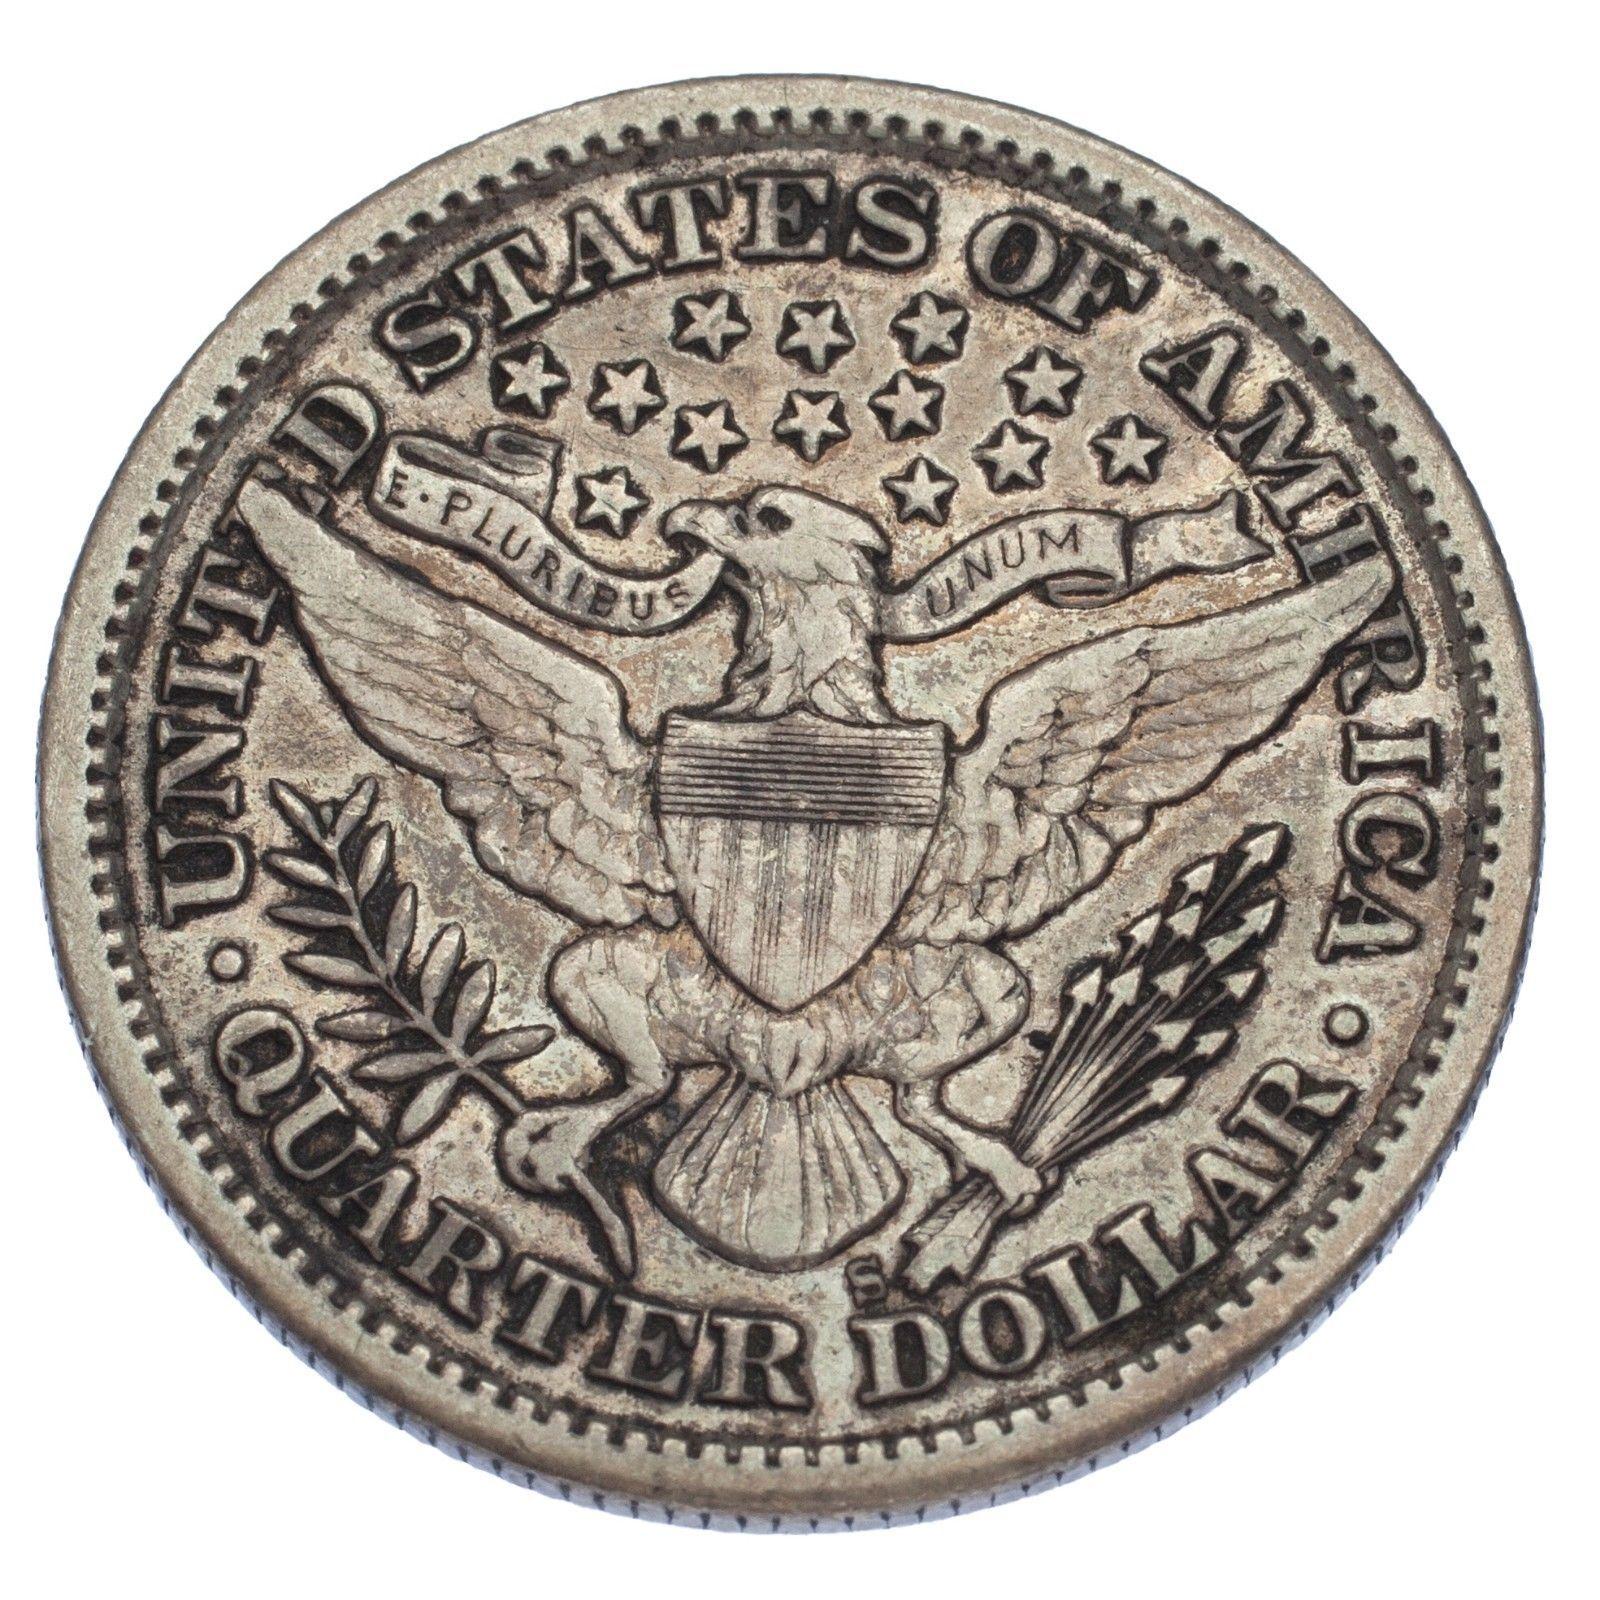 1897-S 25C Barber Quarter (Very Fine, VF Condition) image 3